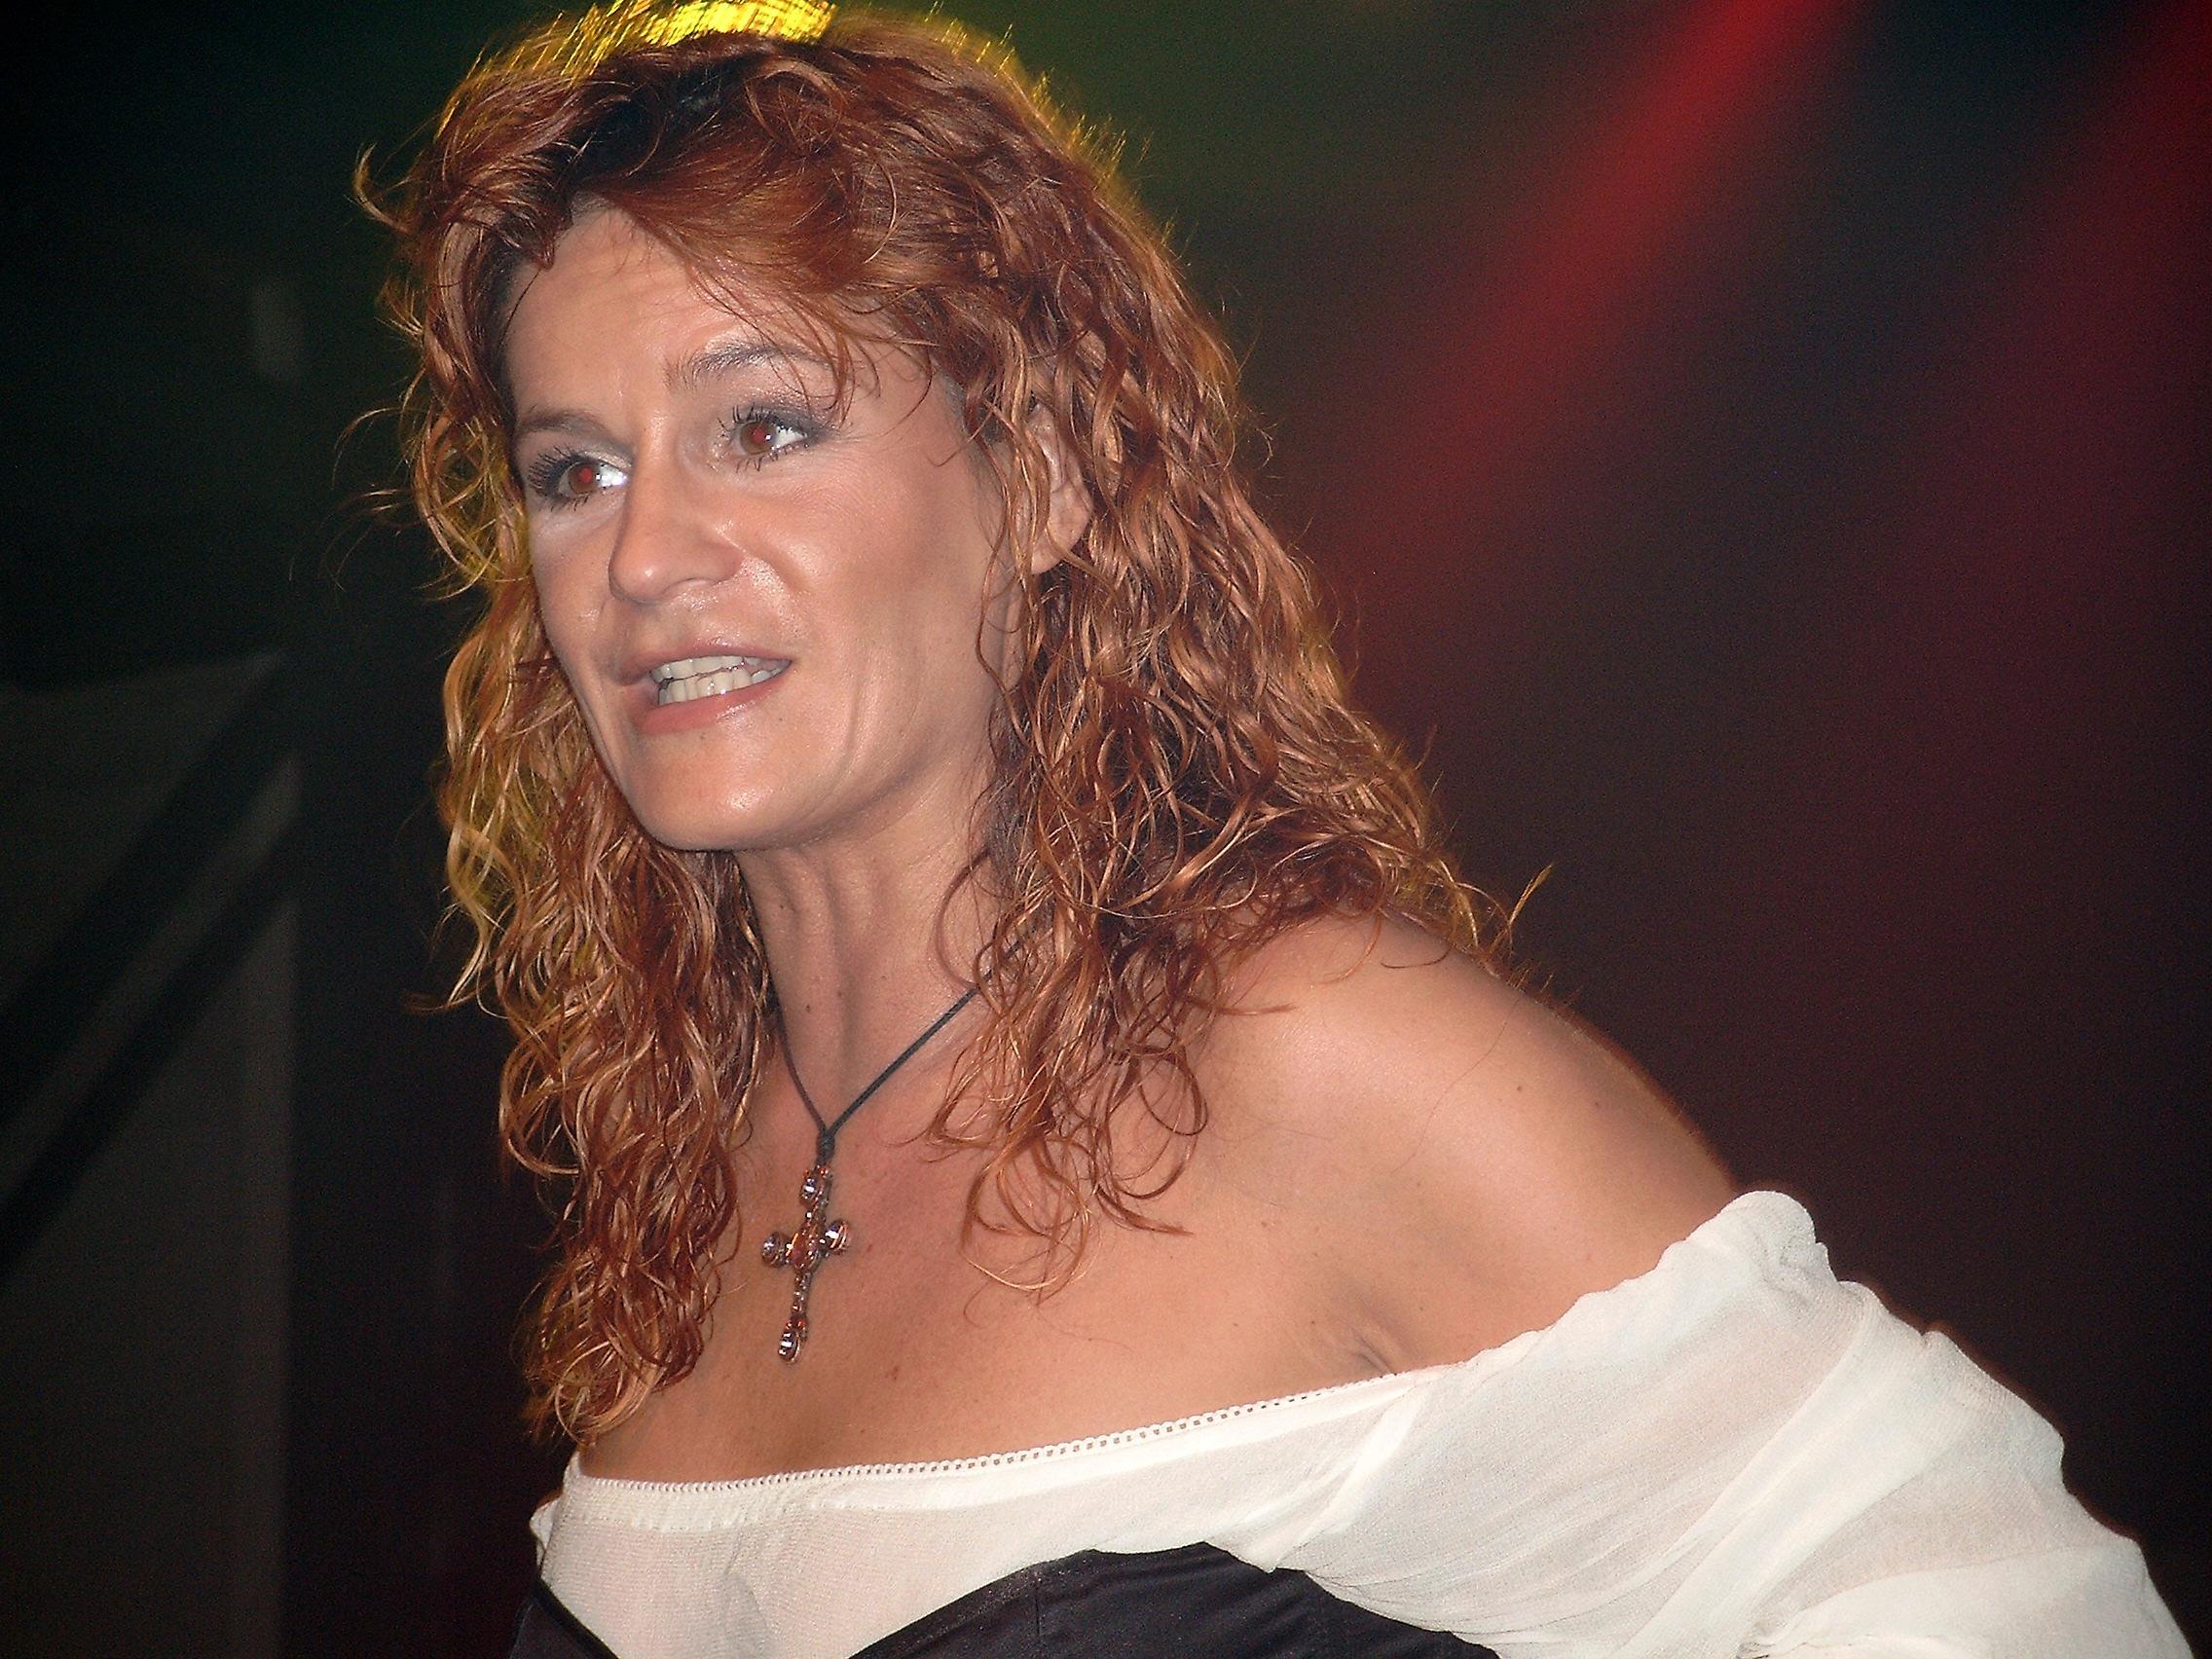 Schlagerparty mit Andrea Berg Neumünster 25.10.2003